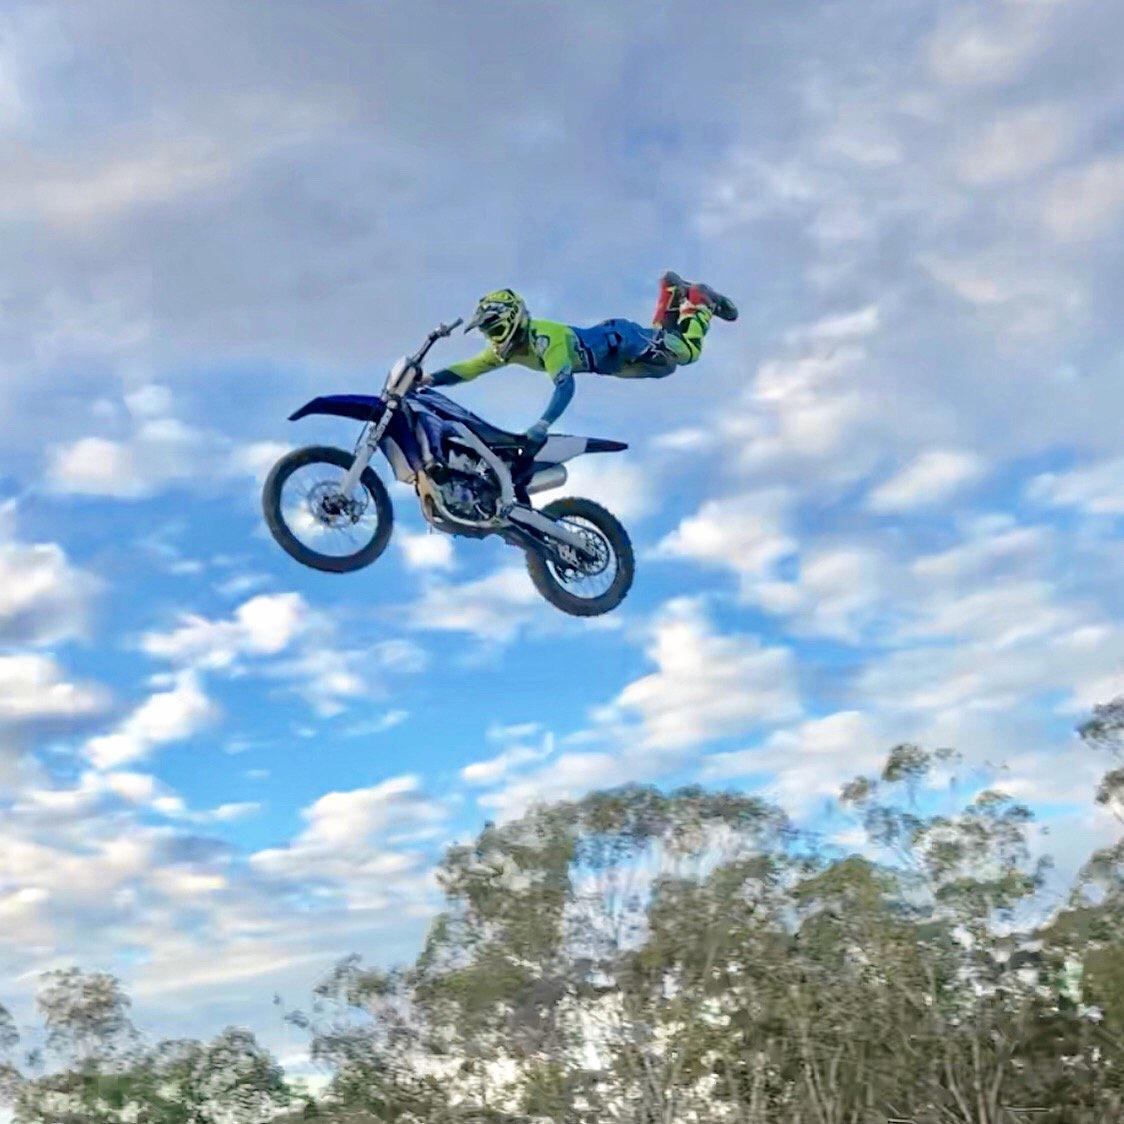 FLYING HIGH: Gladstone motocross rider Reece Smith